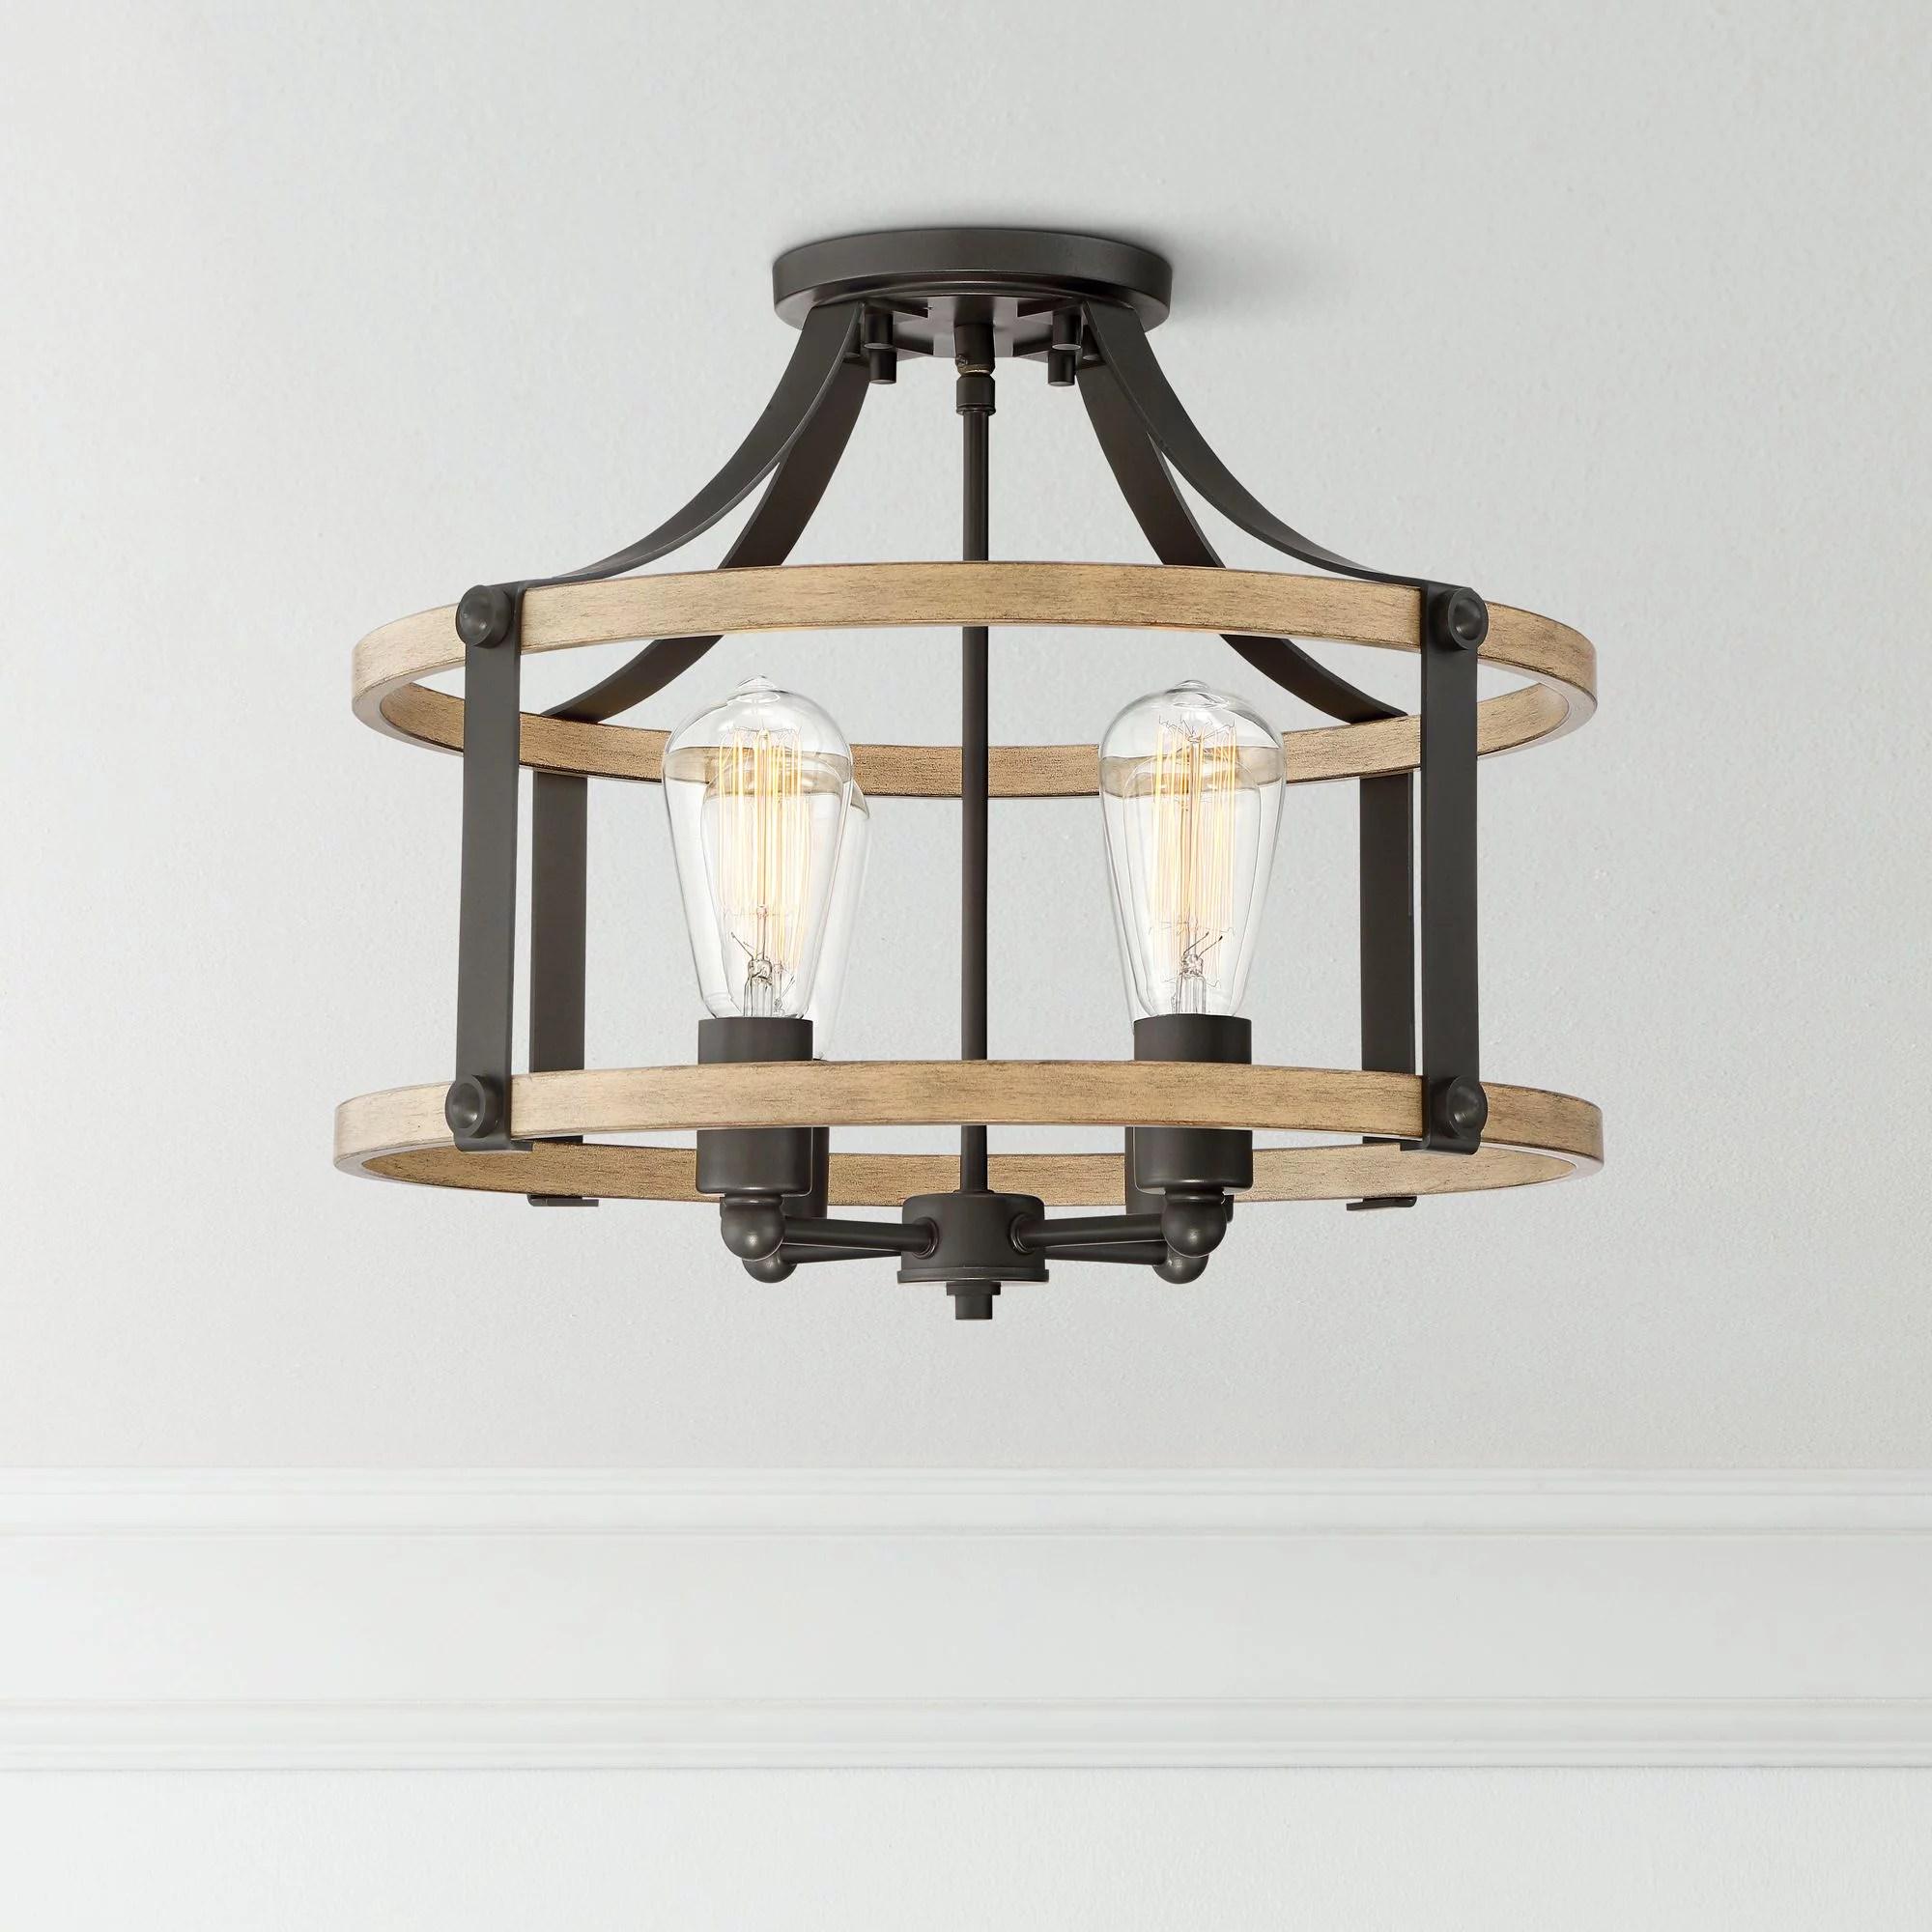 franklin iron works rustic farmhouse ceiling light semi flush mount fixture faux wood black 18 wide 4 light for bedroom kitchen